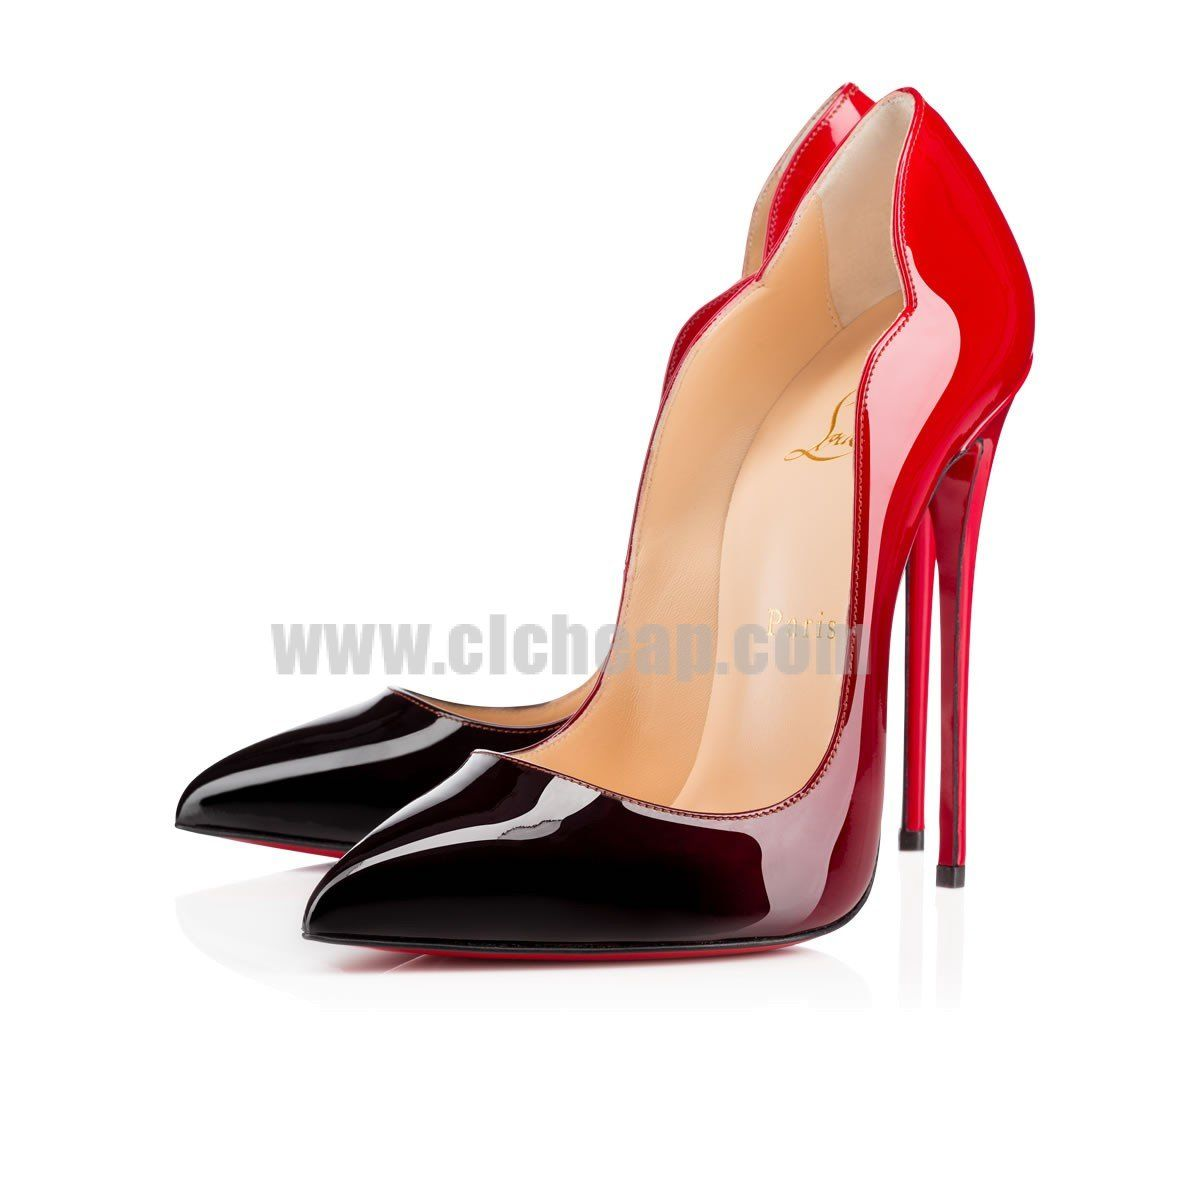 6c2ab93971f Christian Louboutin Hot Chick 130mm Black Red Patent Pumps | Stuff ...